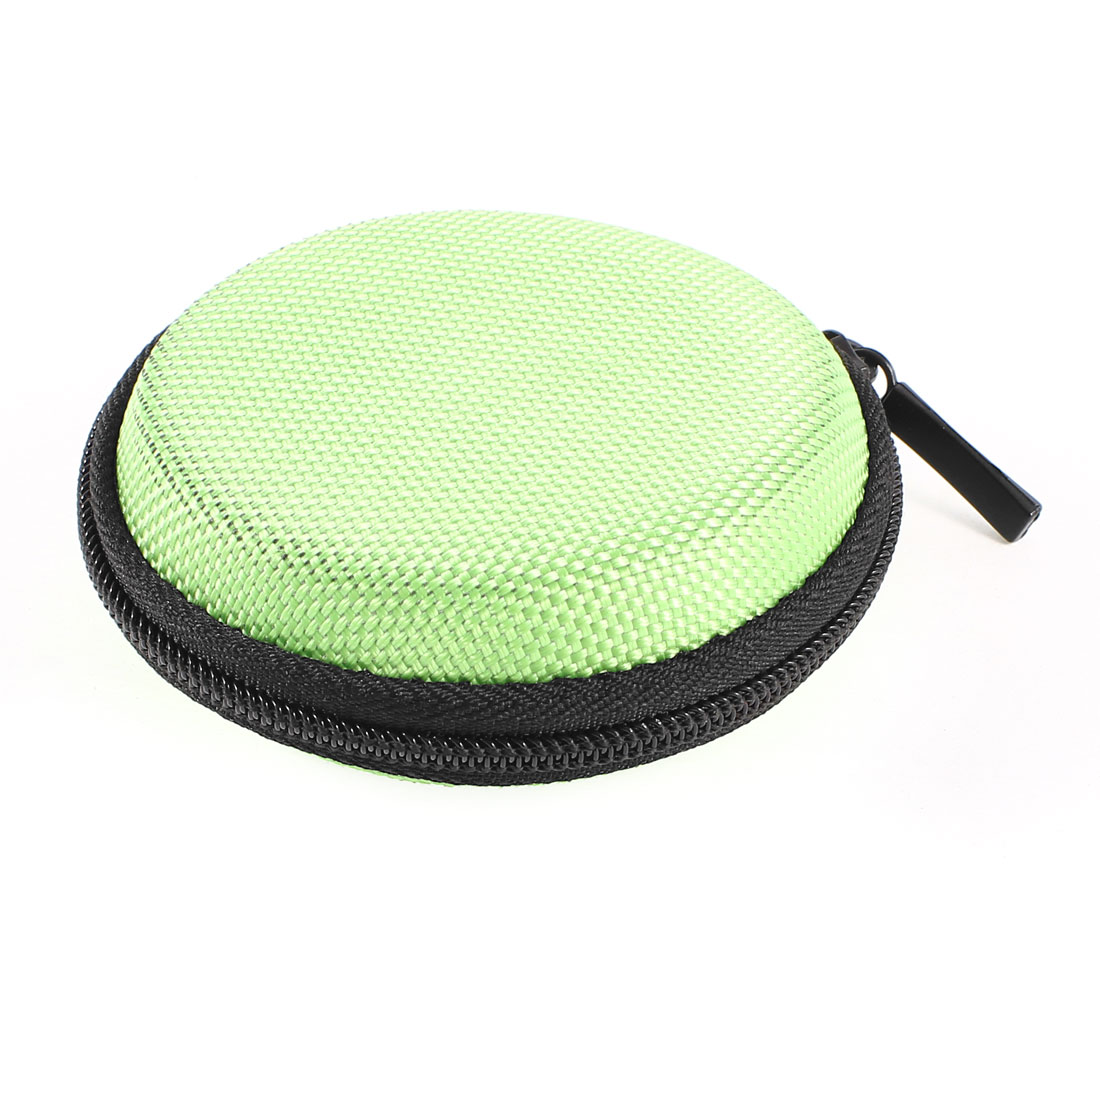 Unique Bargains Green Round Zipper Headphone Earphone Headset Case Pouch Bag Storage